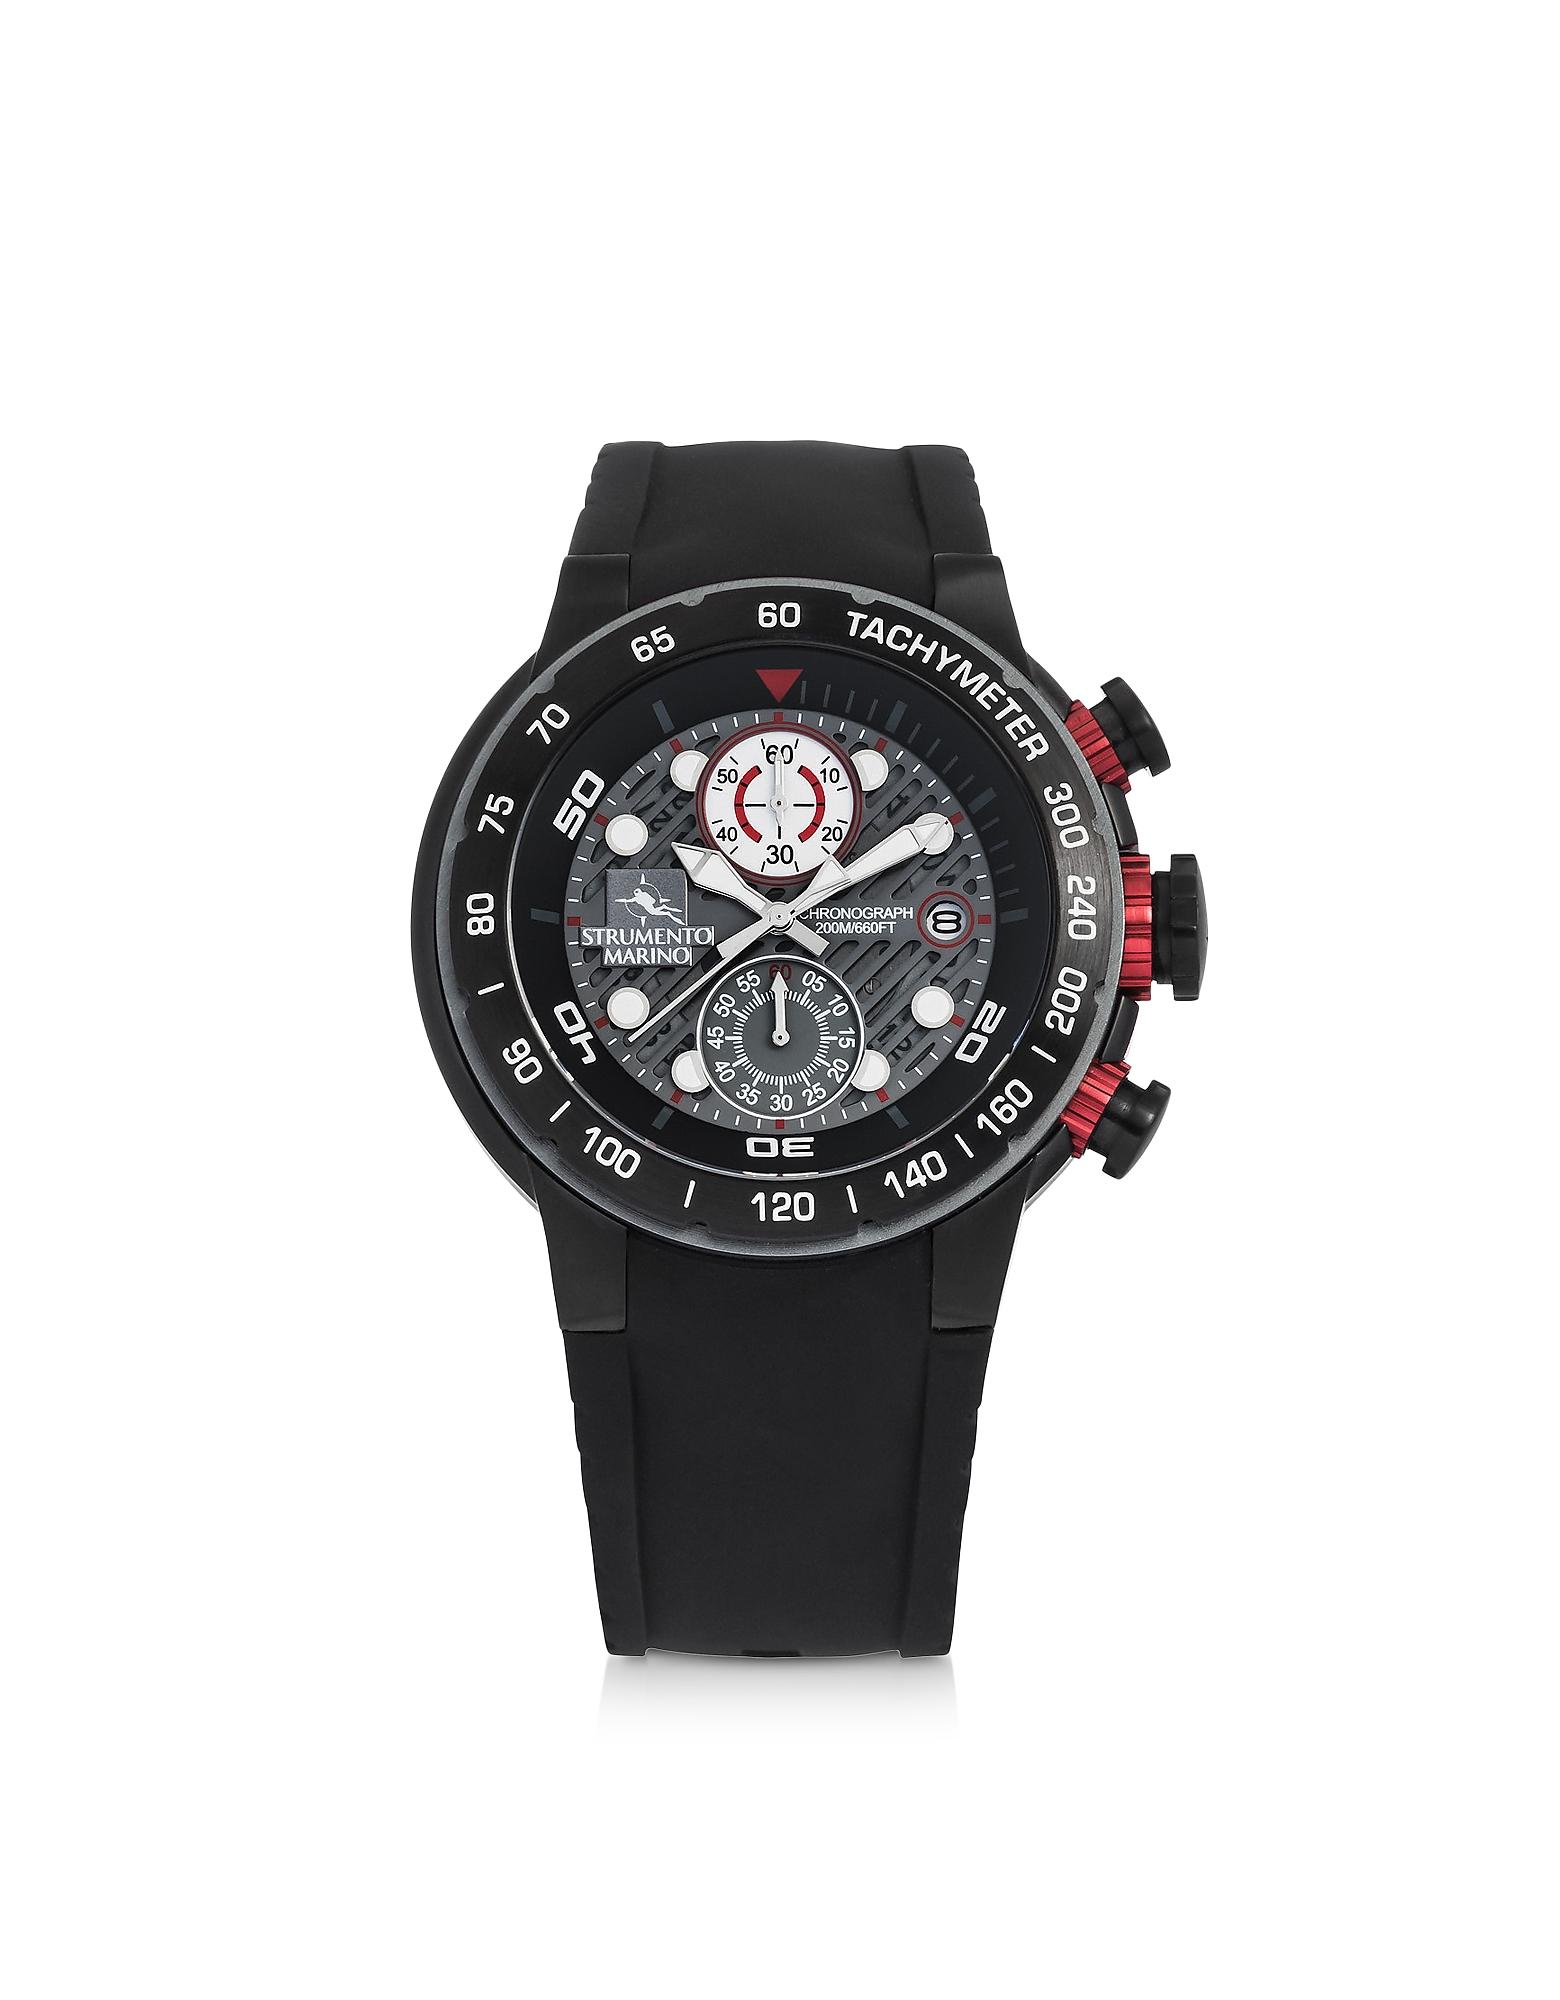 Saint-Tropez Stainless Steel Men's Watch